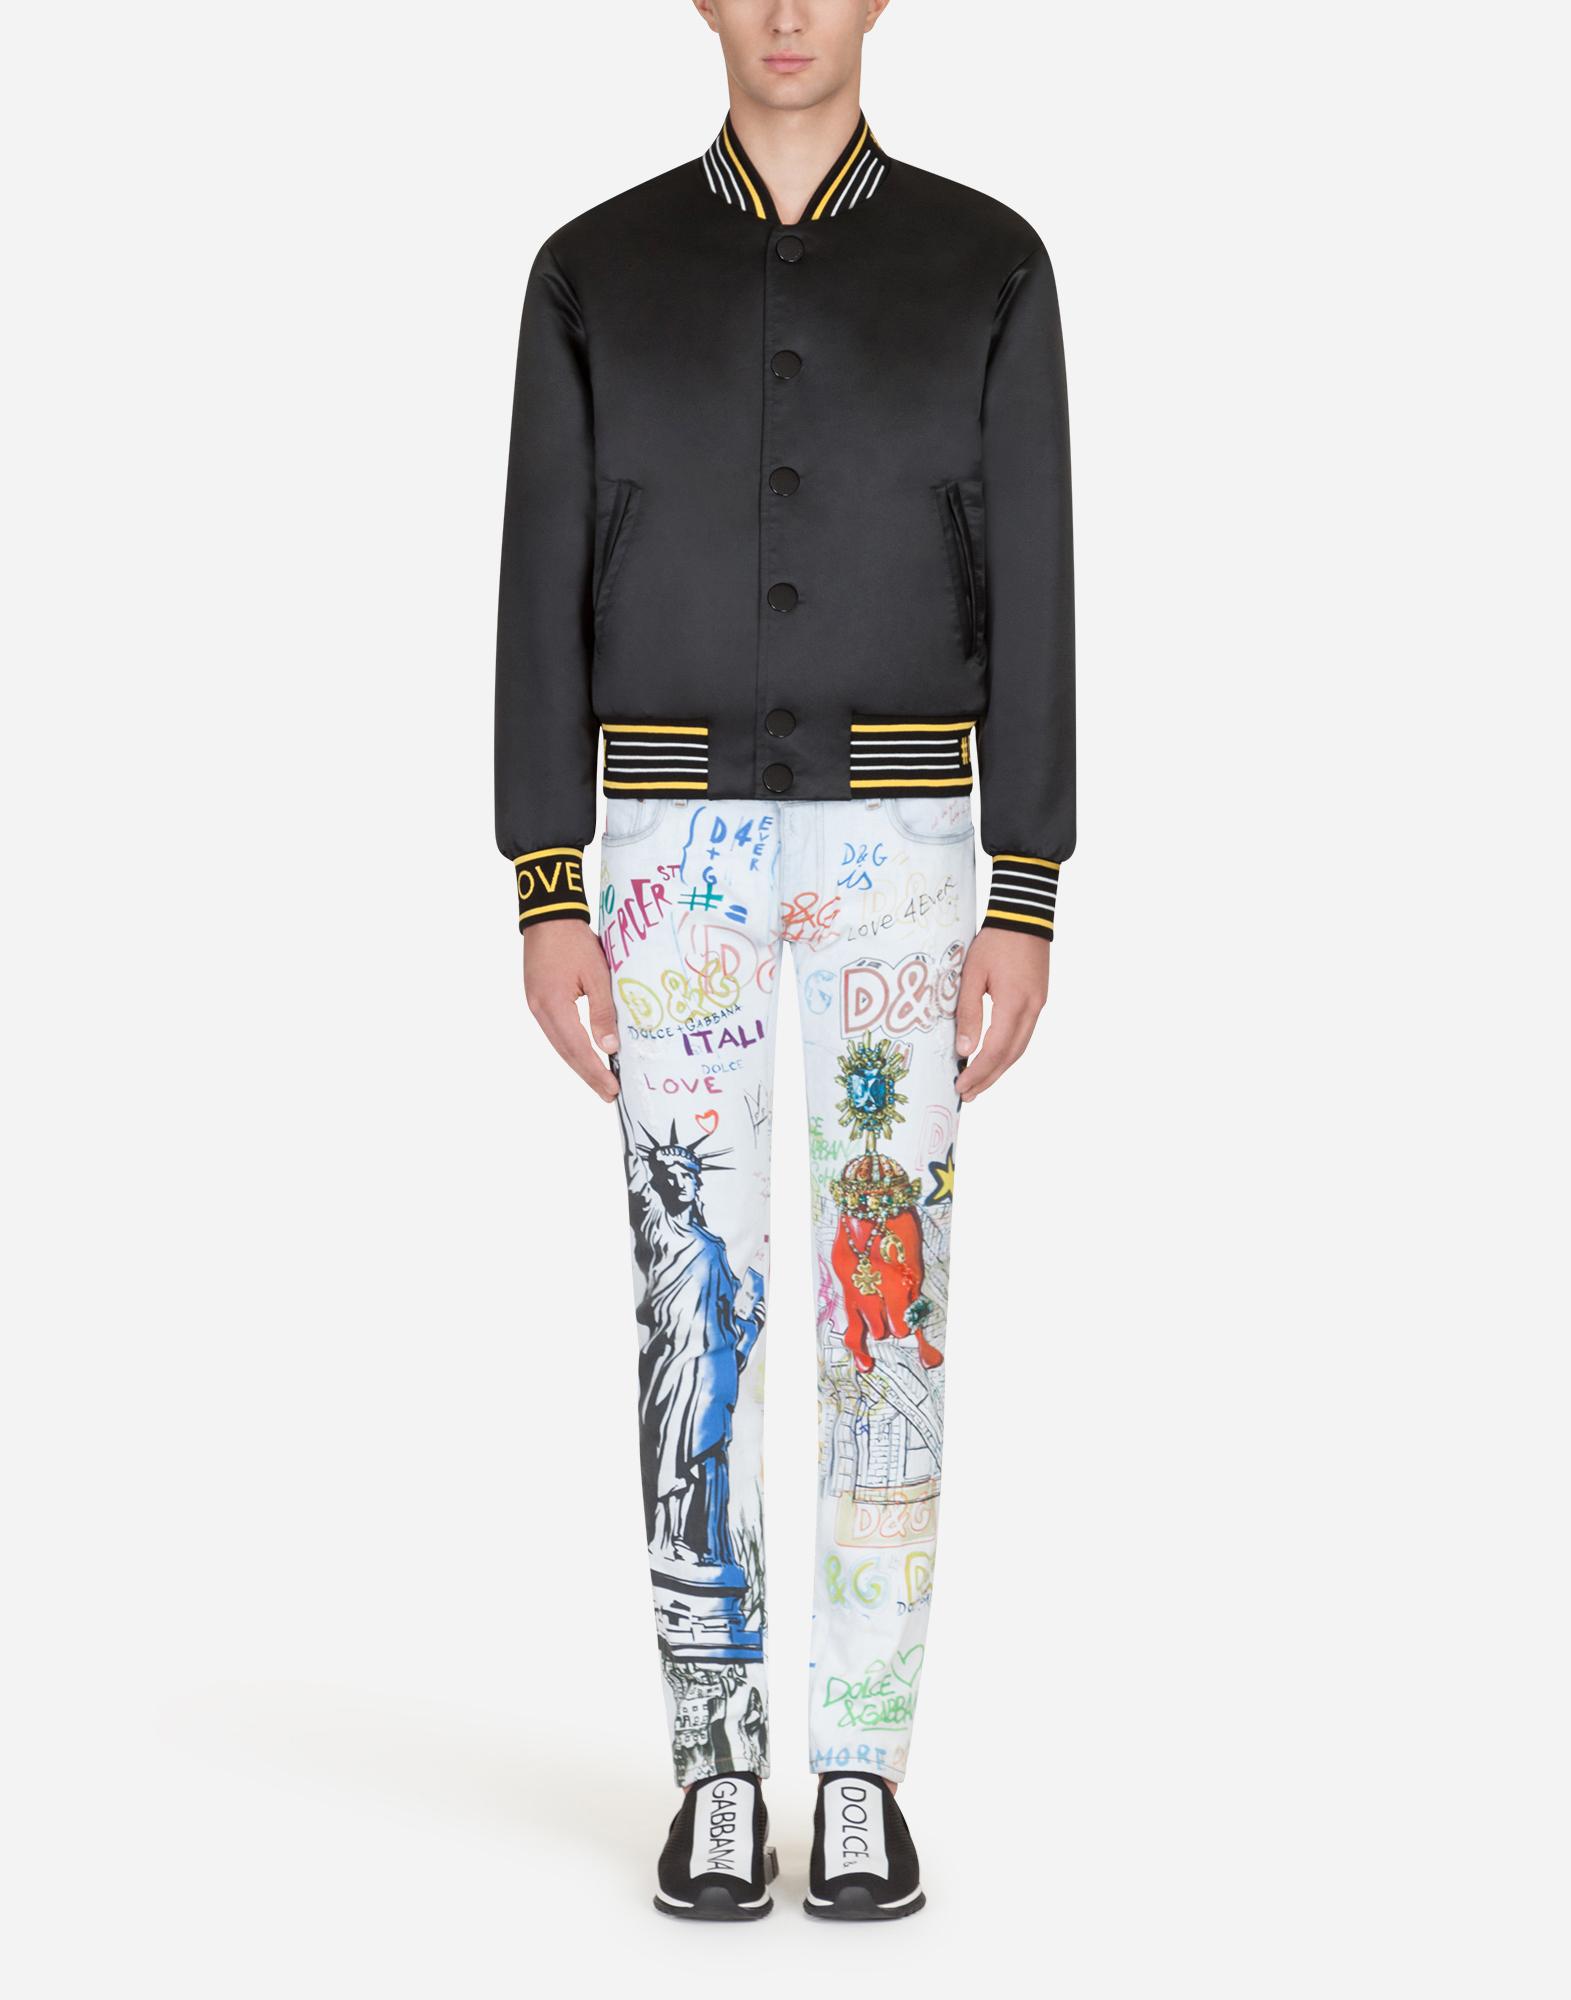 Dolce&Gabbana SKINNY FIT STRETCH JEANS